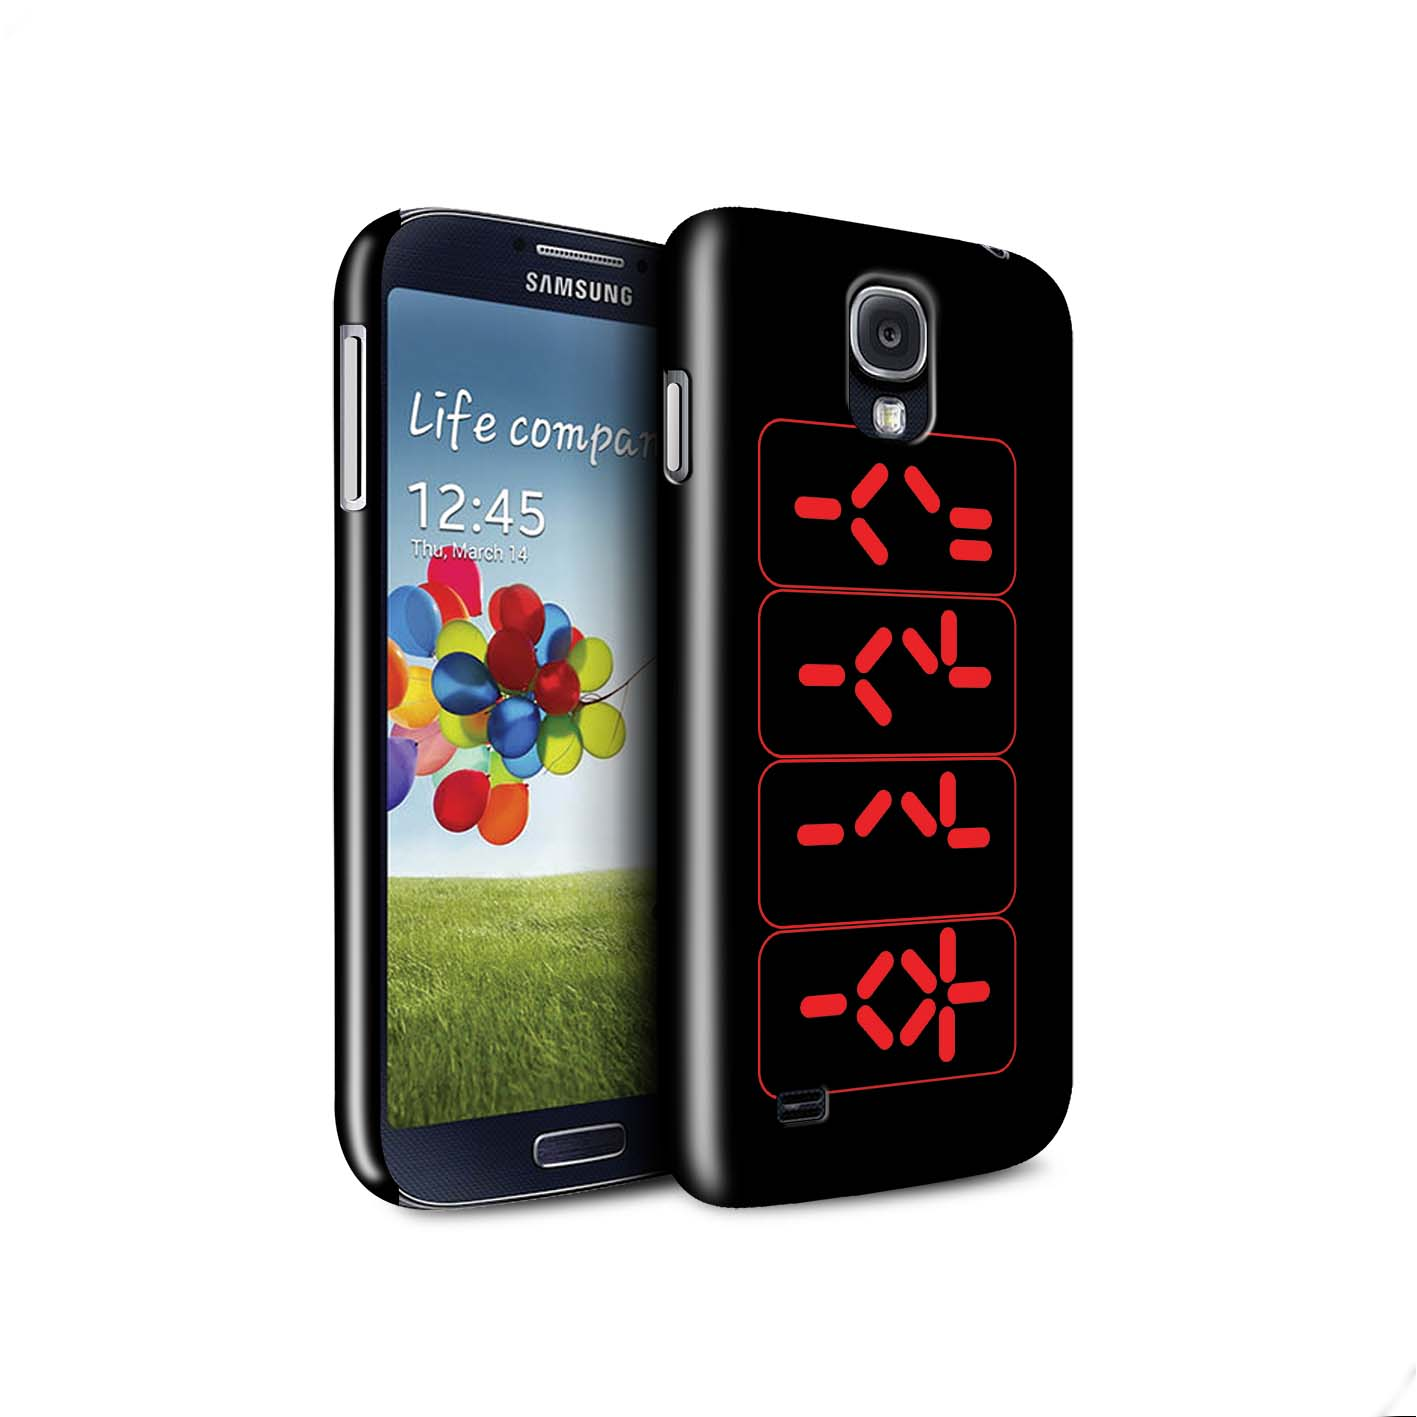 STUFF4-Gloss-Phone-Case-for-Samsung-Galaxy-S4-SIV-Alien-Hunter-Film-Art